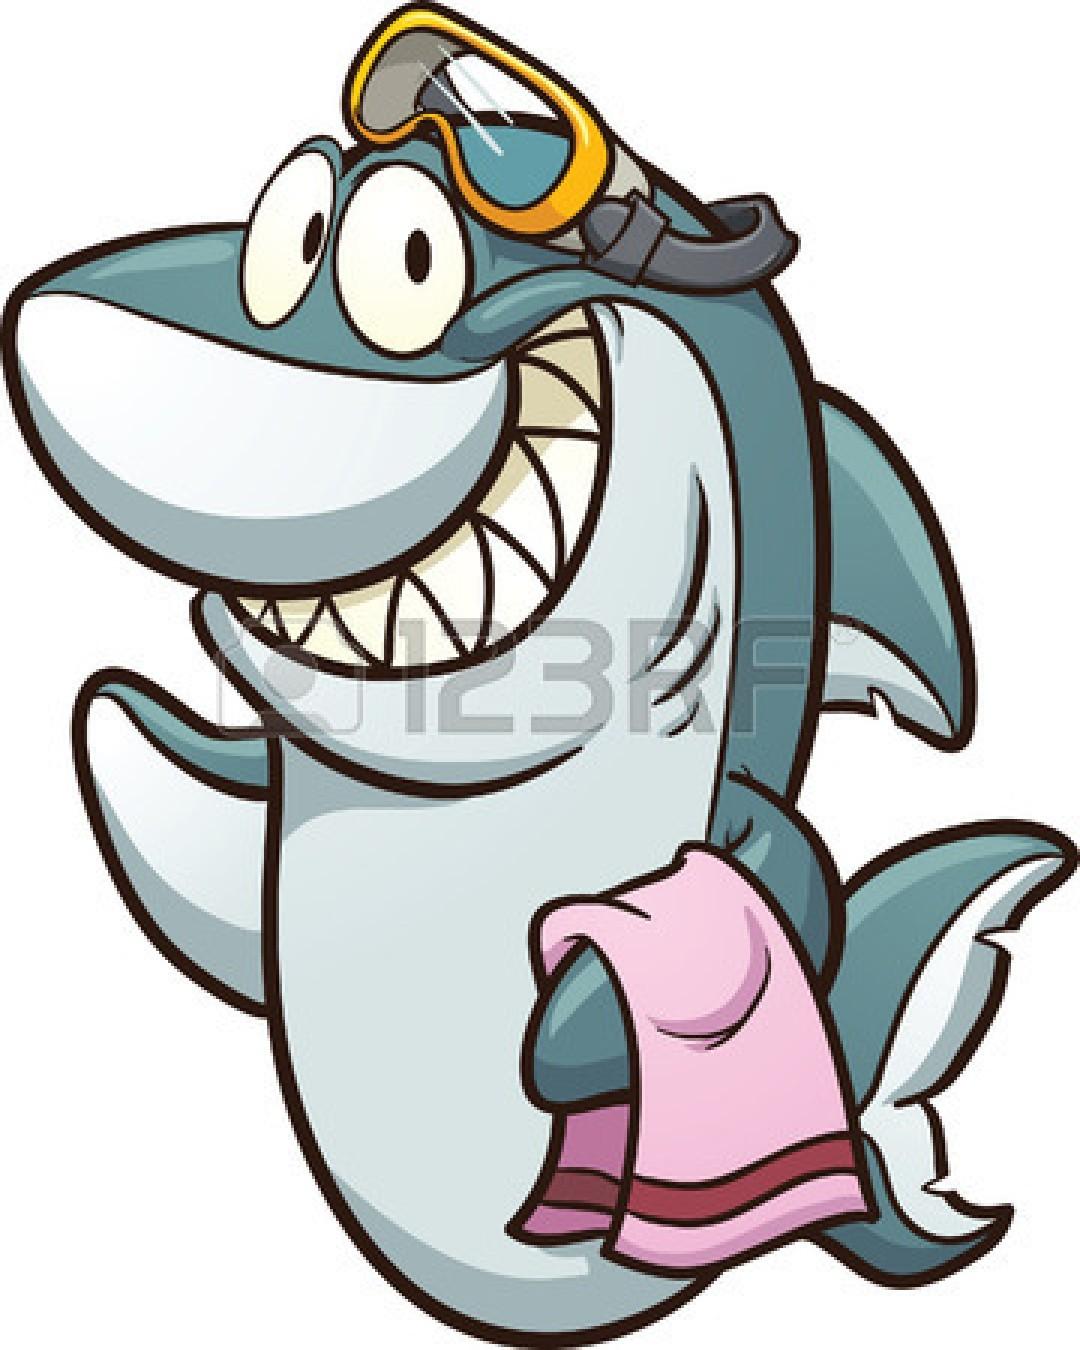 Happy Shark Clipart | Clipart Panda - Free Clipart Images